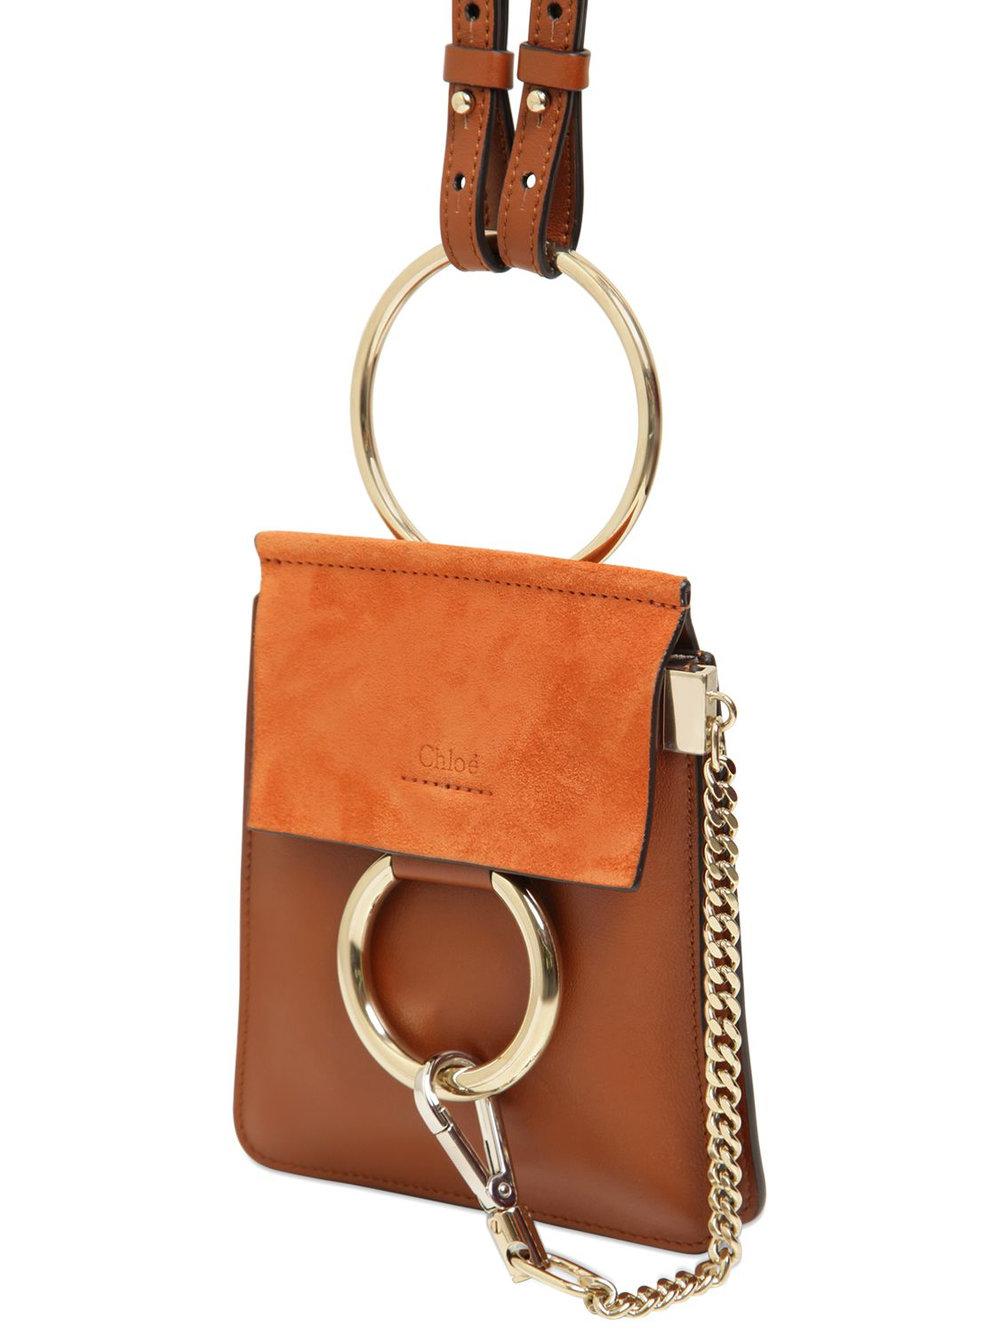 chloe-tobacco-brown-mini-faye-leather-suede-shoulder-bag-brown-product-3-408250372-normal.jpg